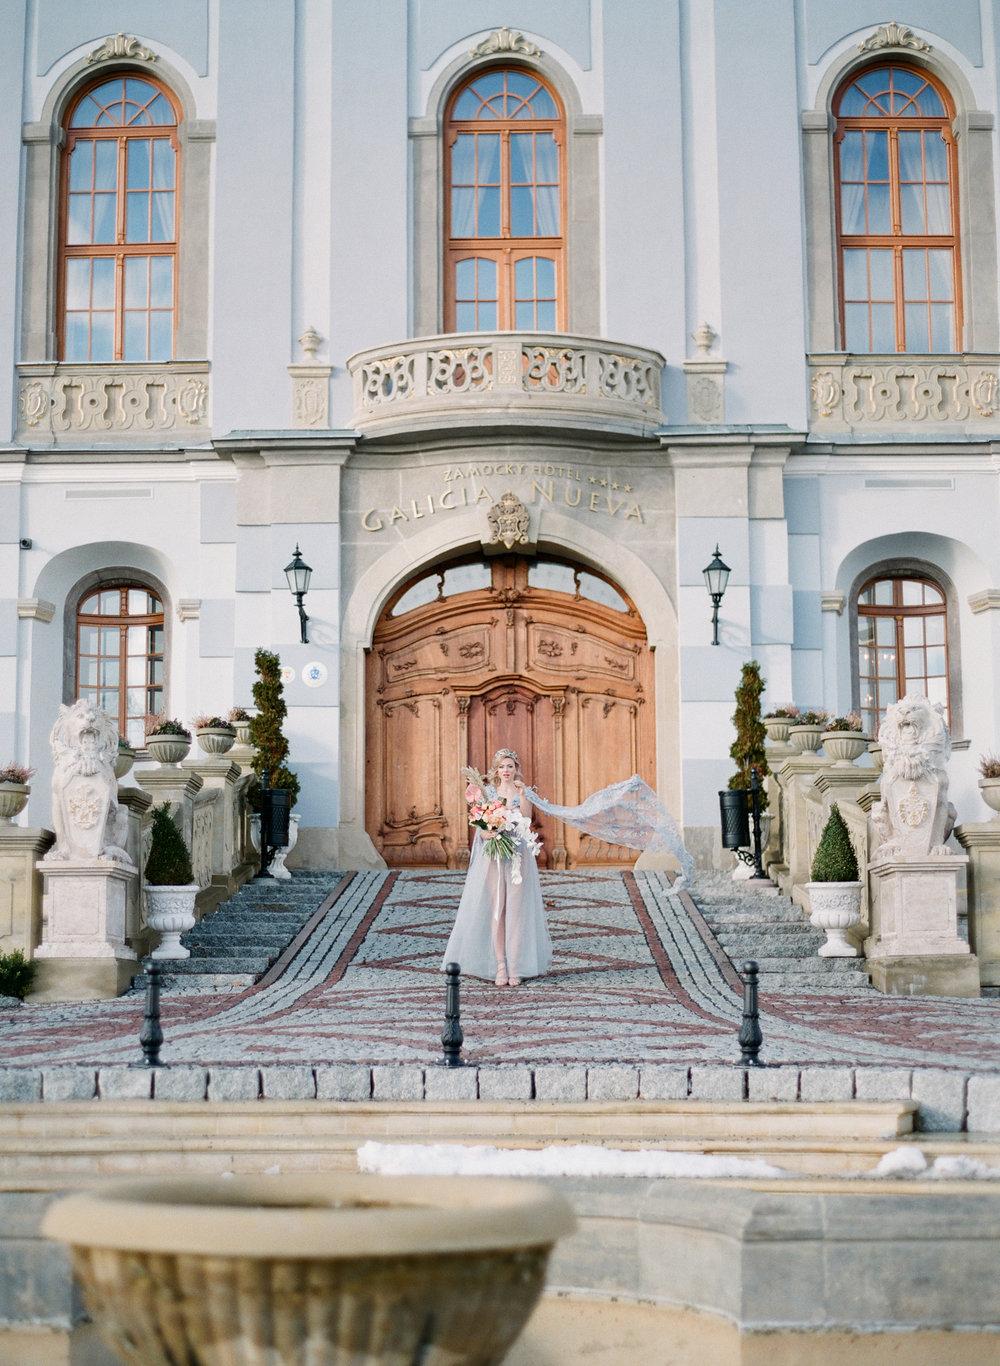 galicia_nueva_wedding_egitorial_nikol_bodnarova_82.JPG